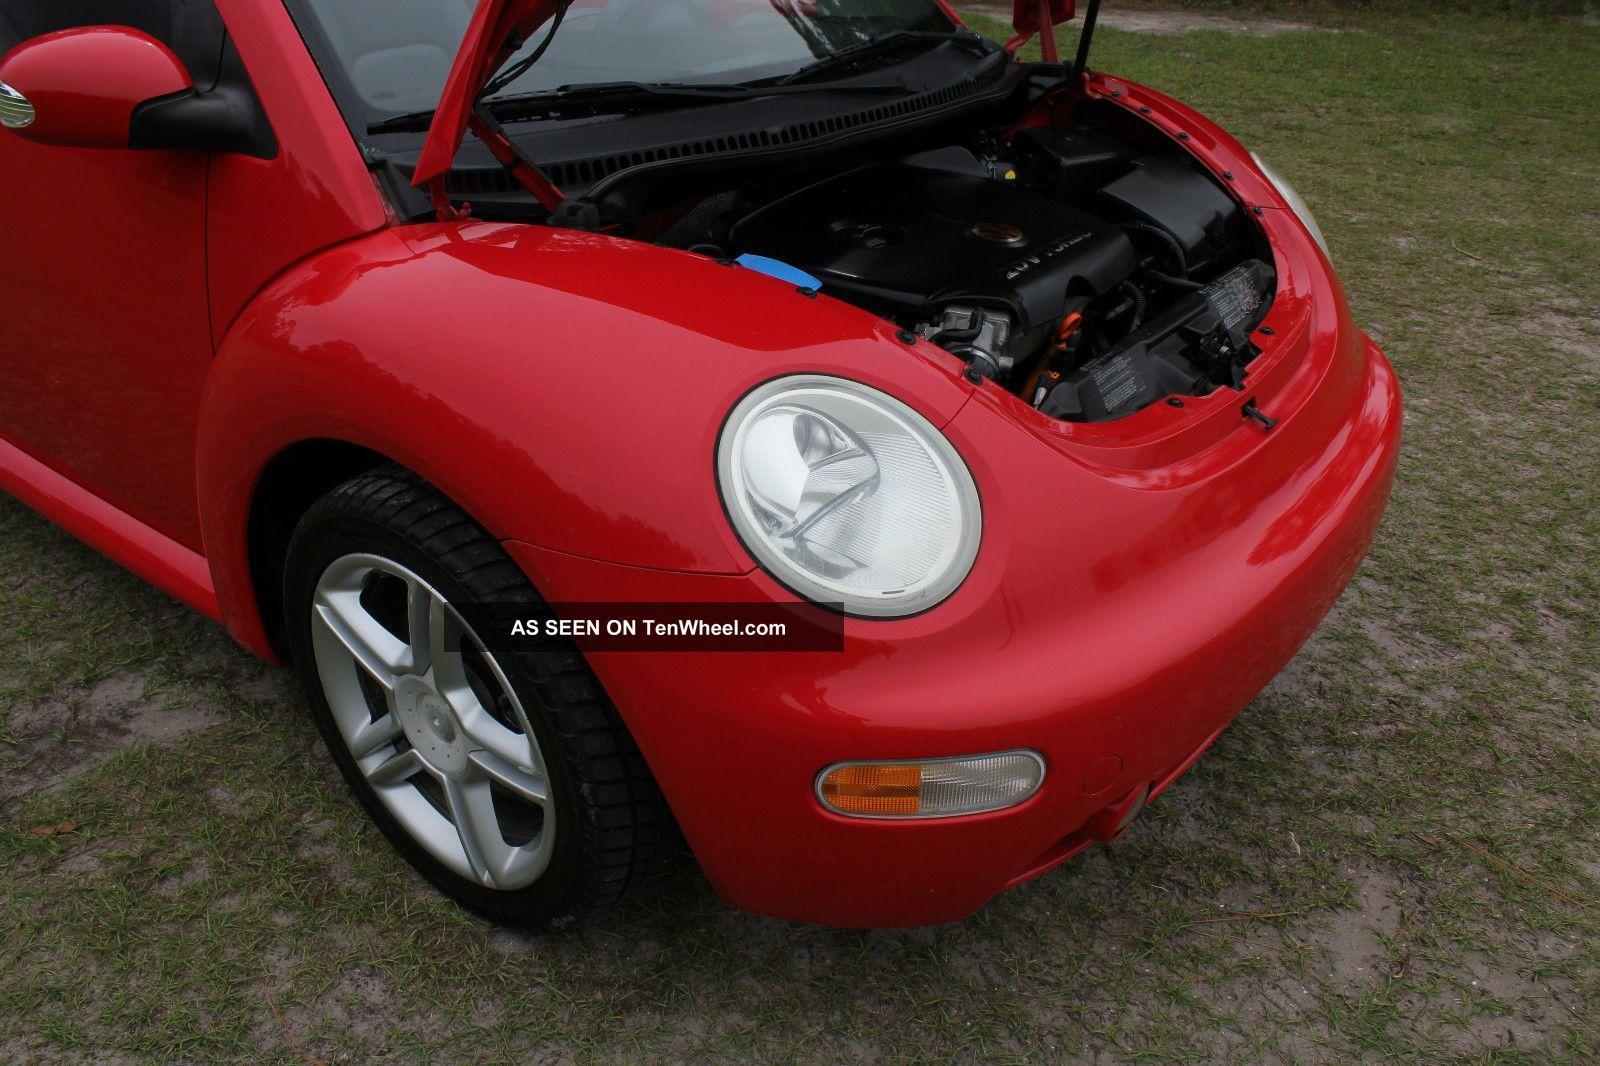 2004 volkswagen gls turbo beetle convertible now. Black Bedroom Furniture Sets. Home Design Ideas